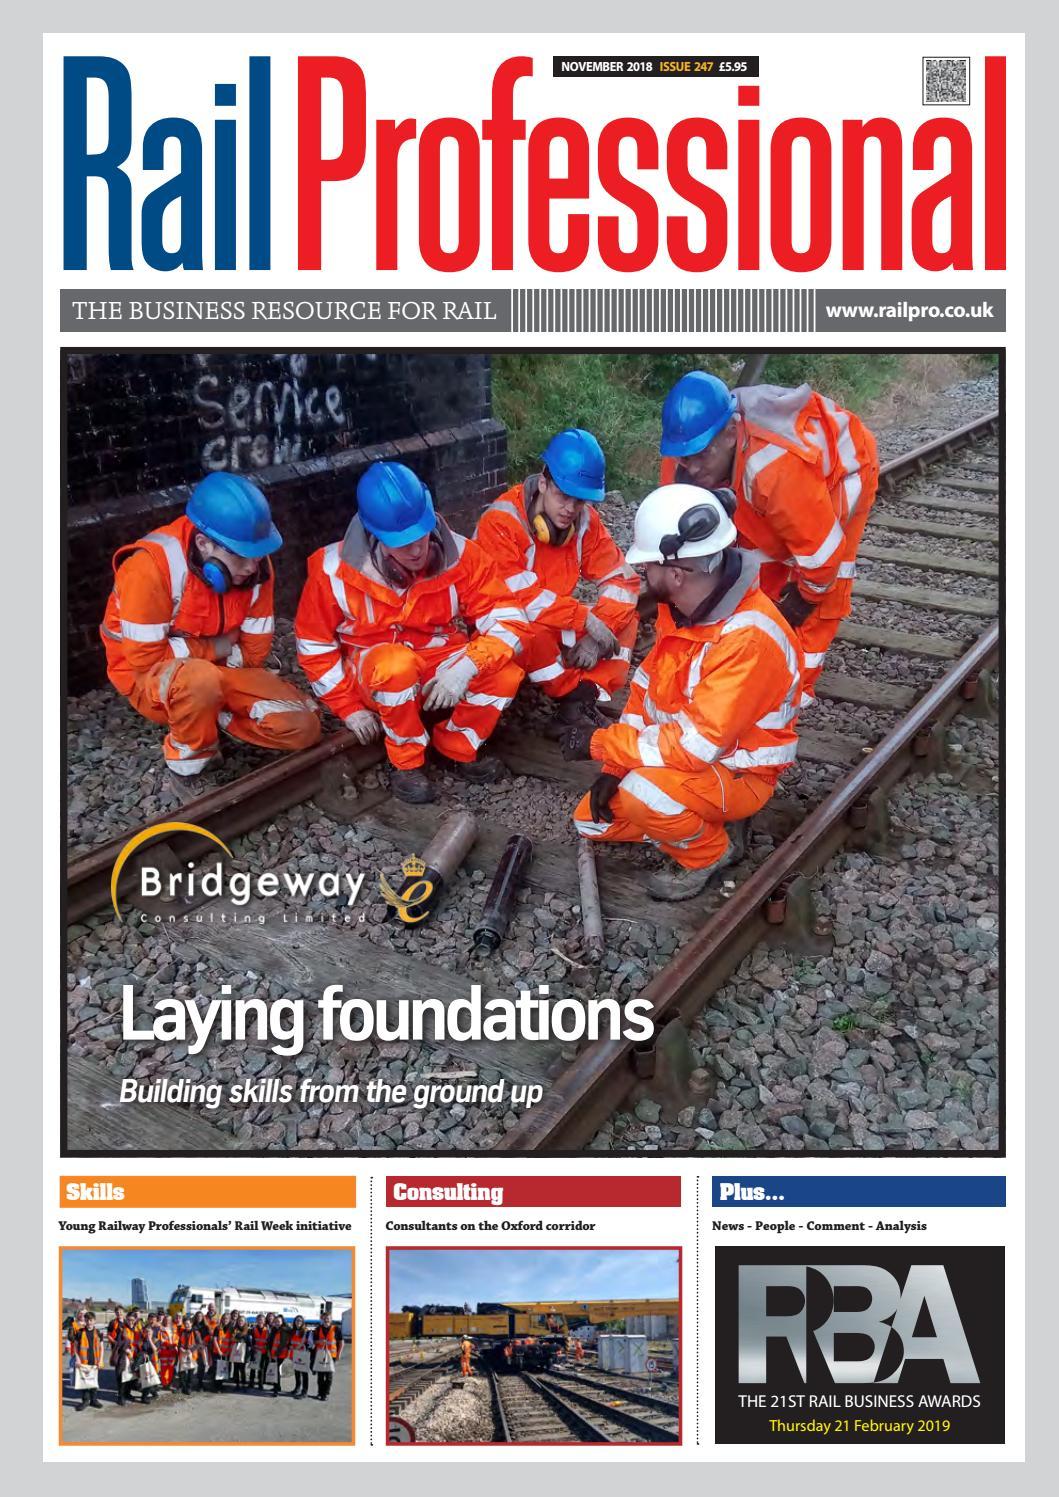 5ca893fd05 RAIL PROFESSIONAL - NOVEMBER 2018 ISSUE by Rail Professional Magazine -  issuu